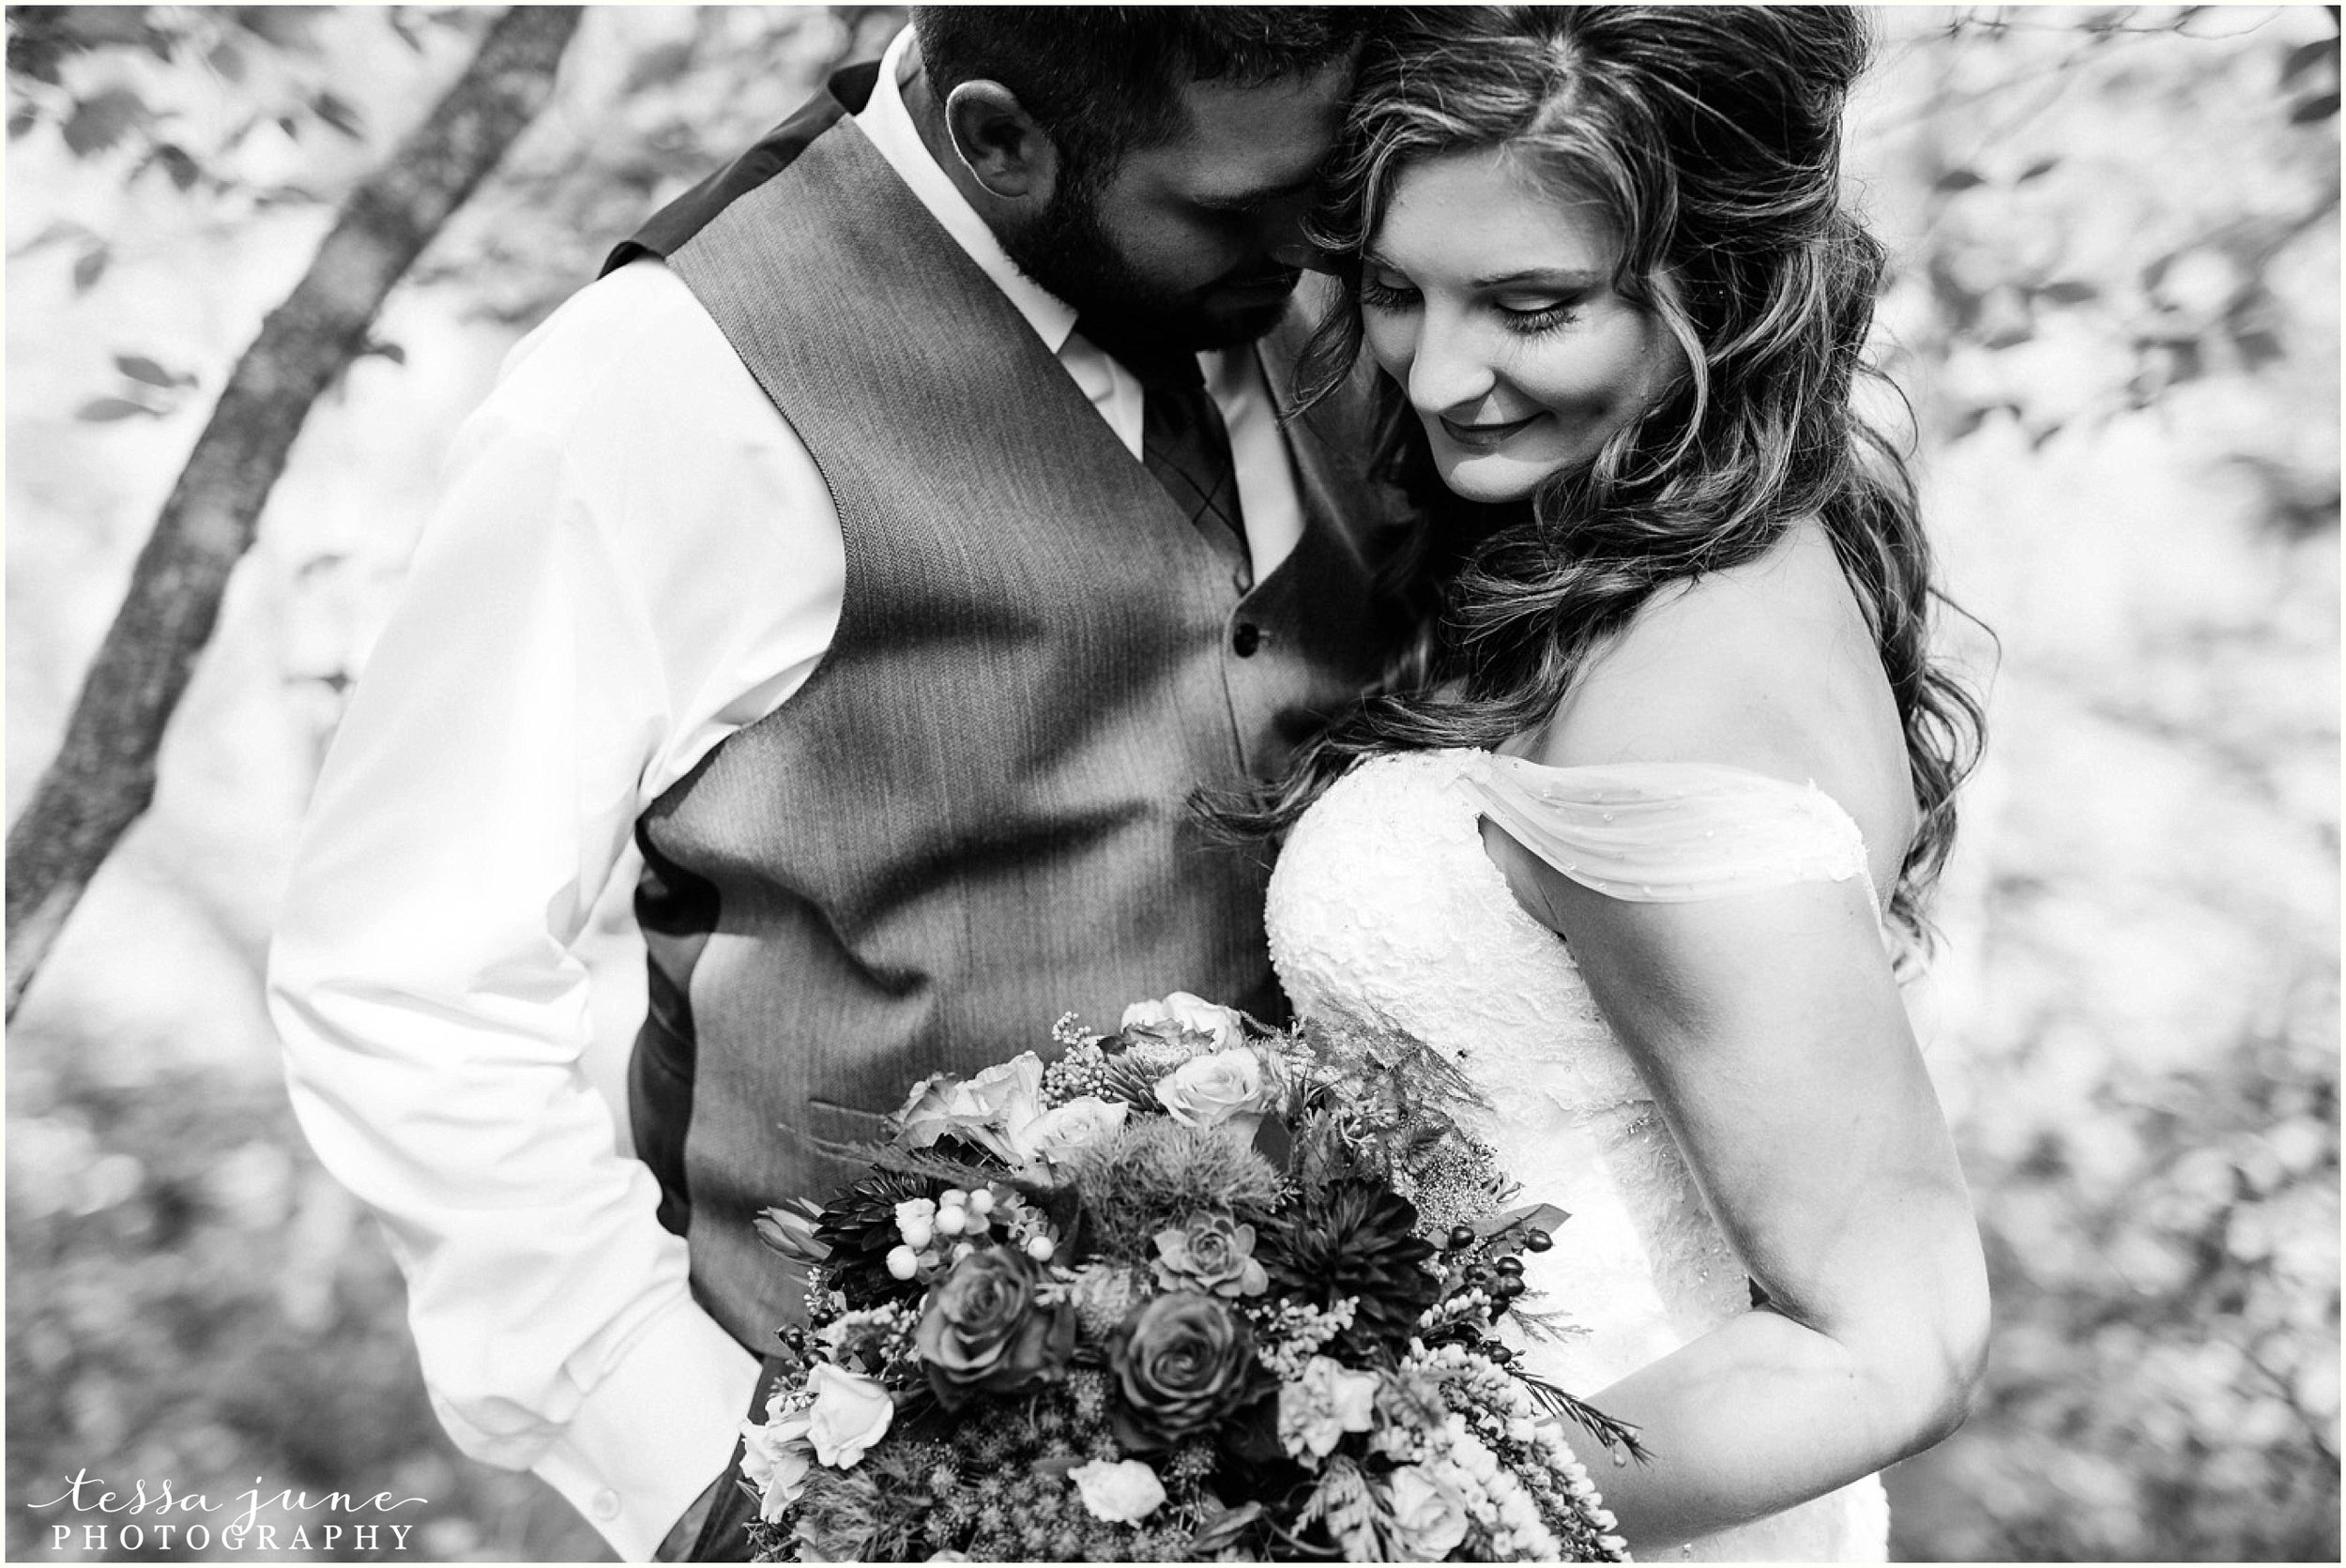 bohemian-minnesota-wedding-mismatched-bridesmaid-dresses-waterfall-st-cloud-tessa-june-photography-50.jpg